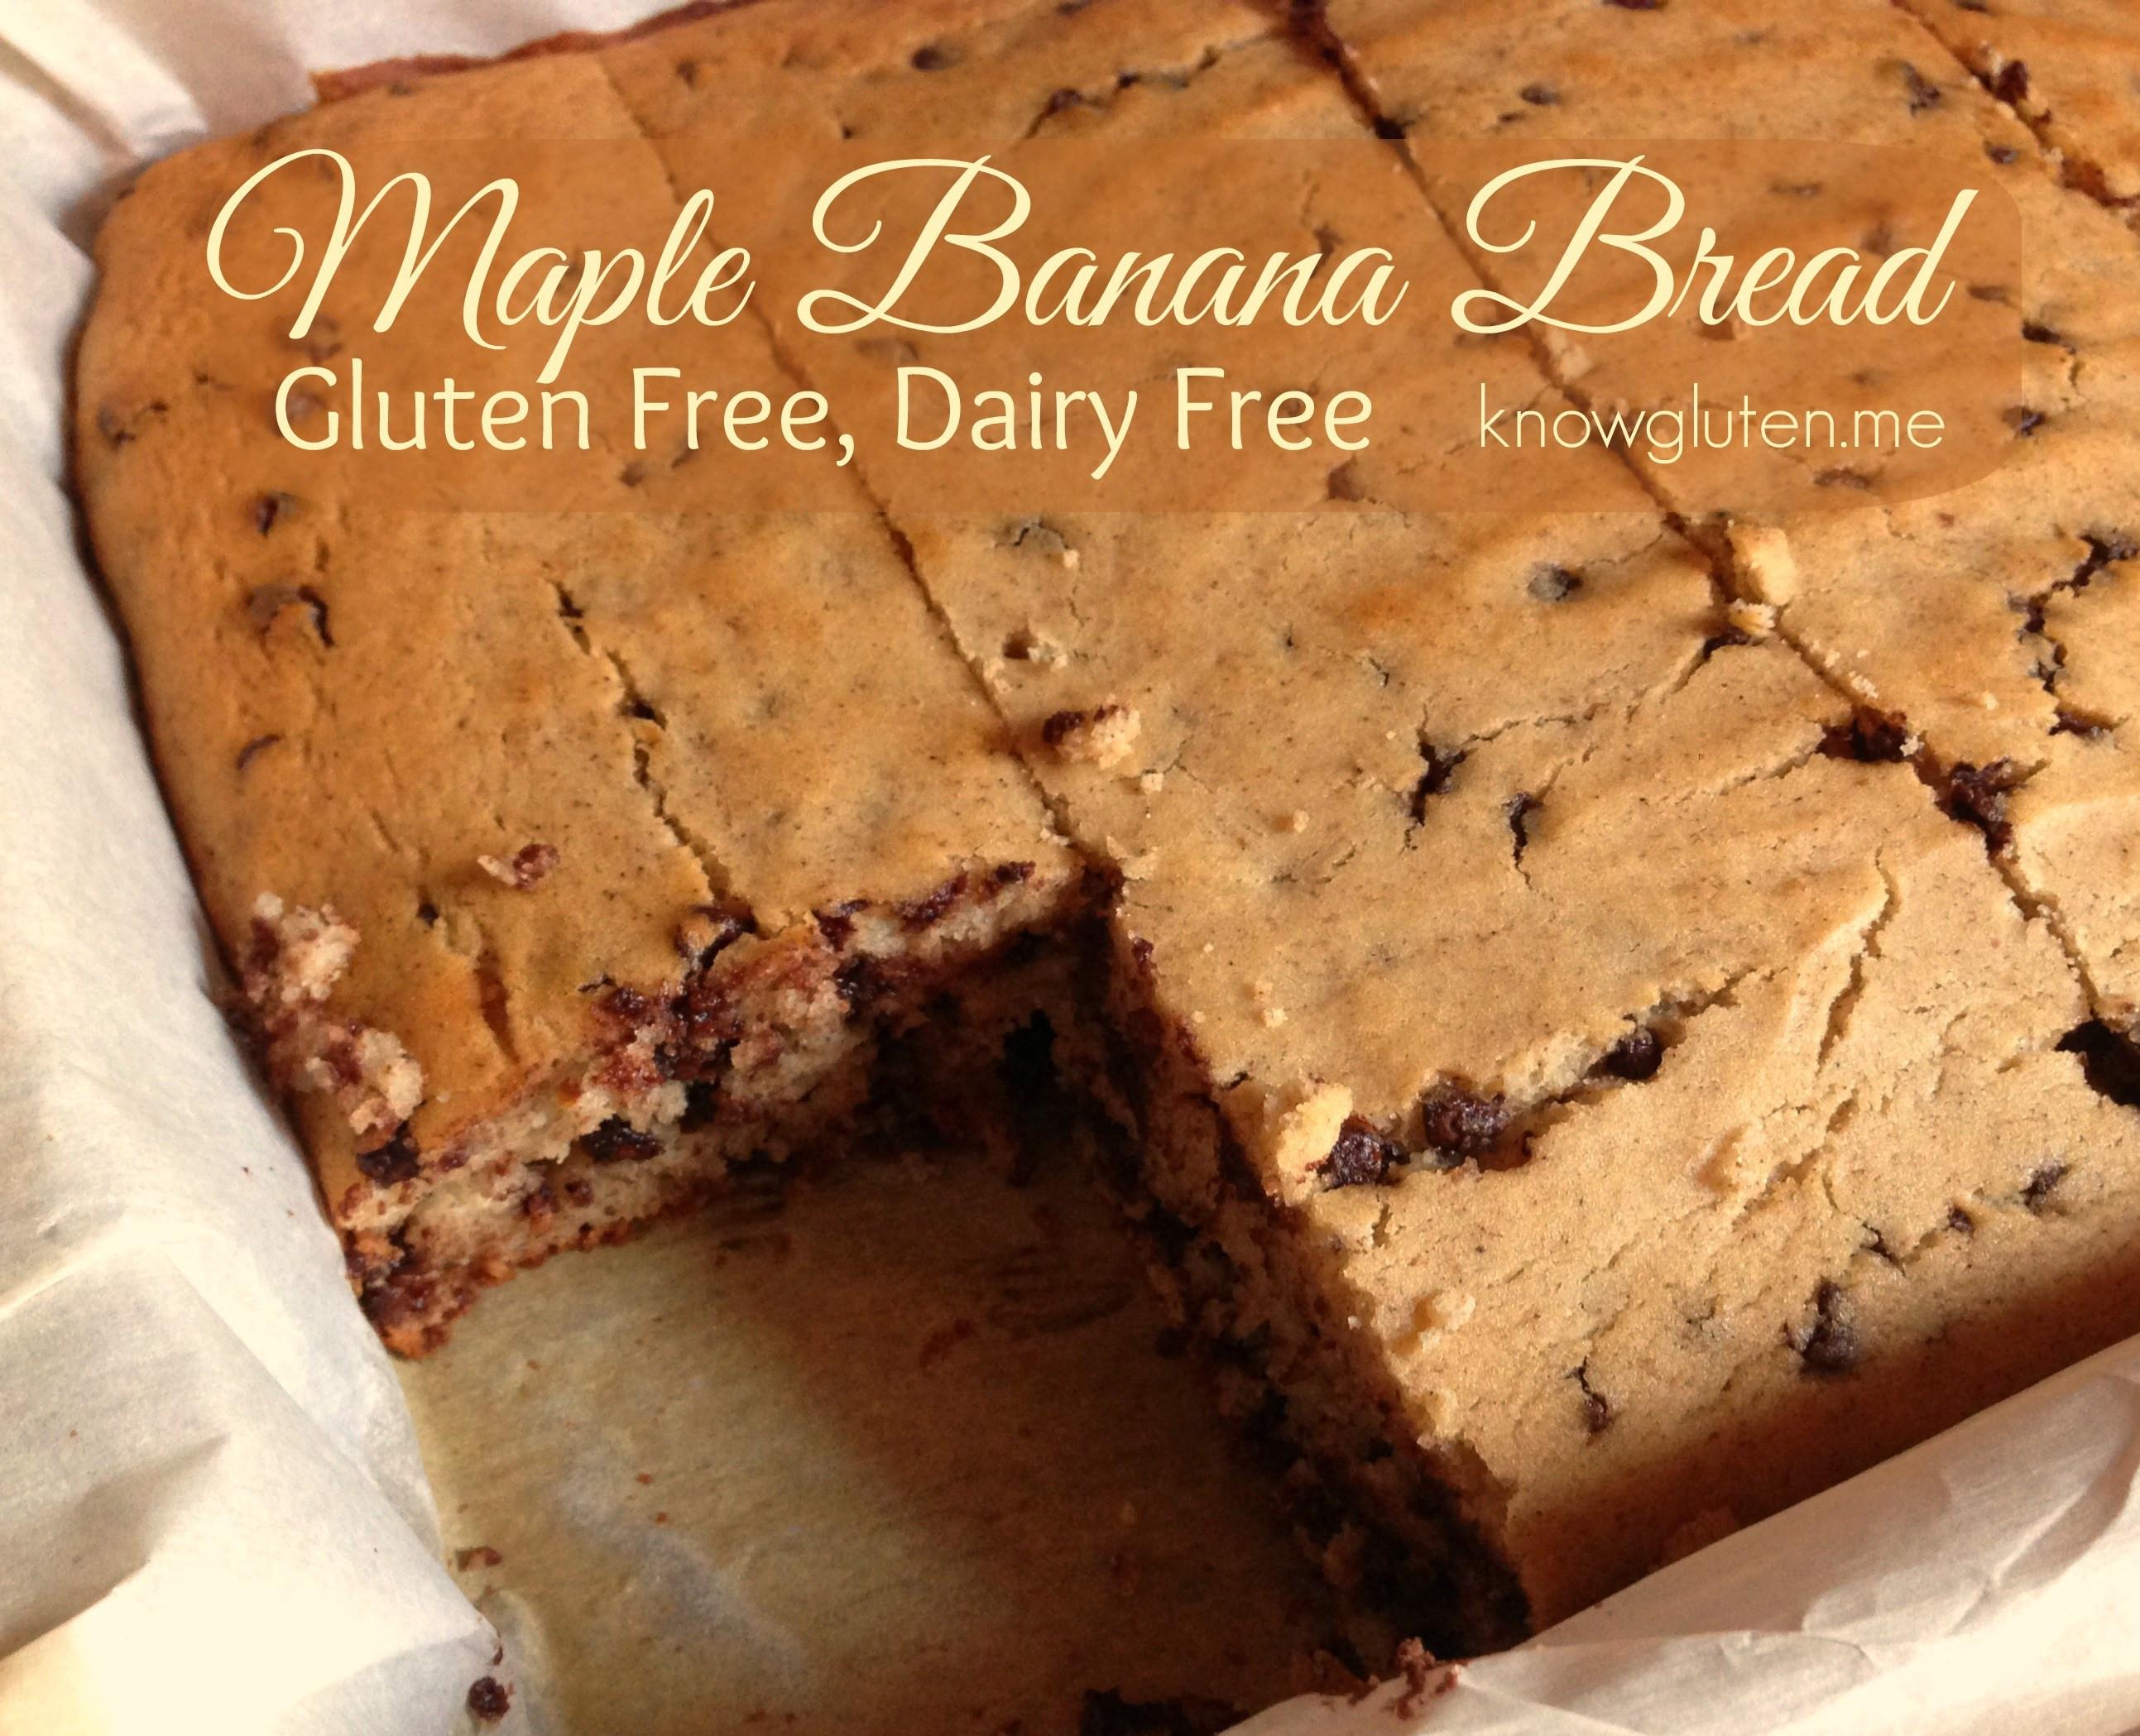 Bob'S Red Mill Gluten Free Banana Bread  Gluten Free Dairy Free Maple Banana Bread know gluten